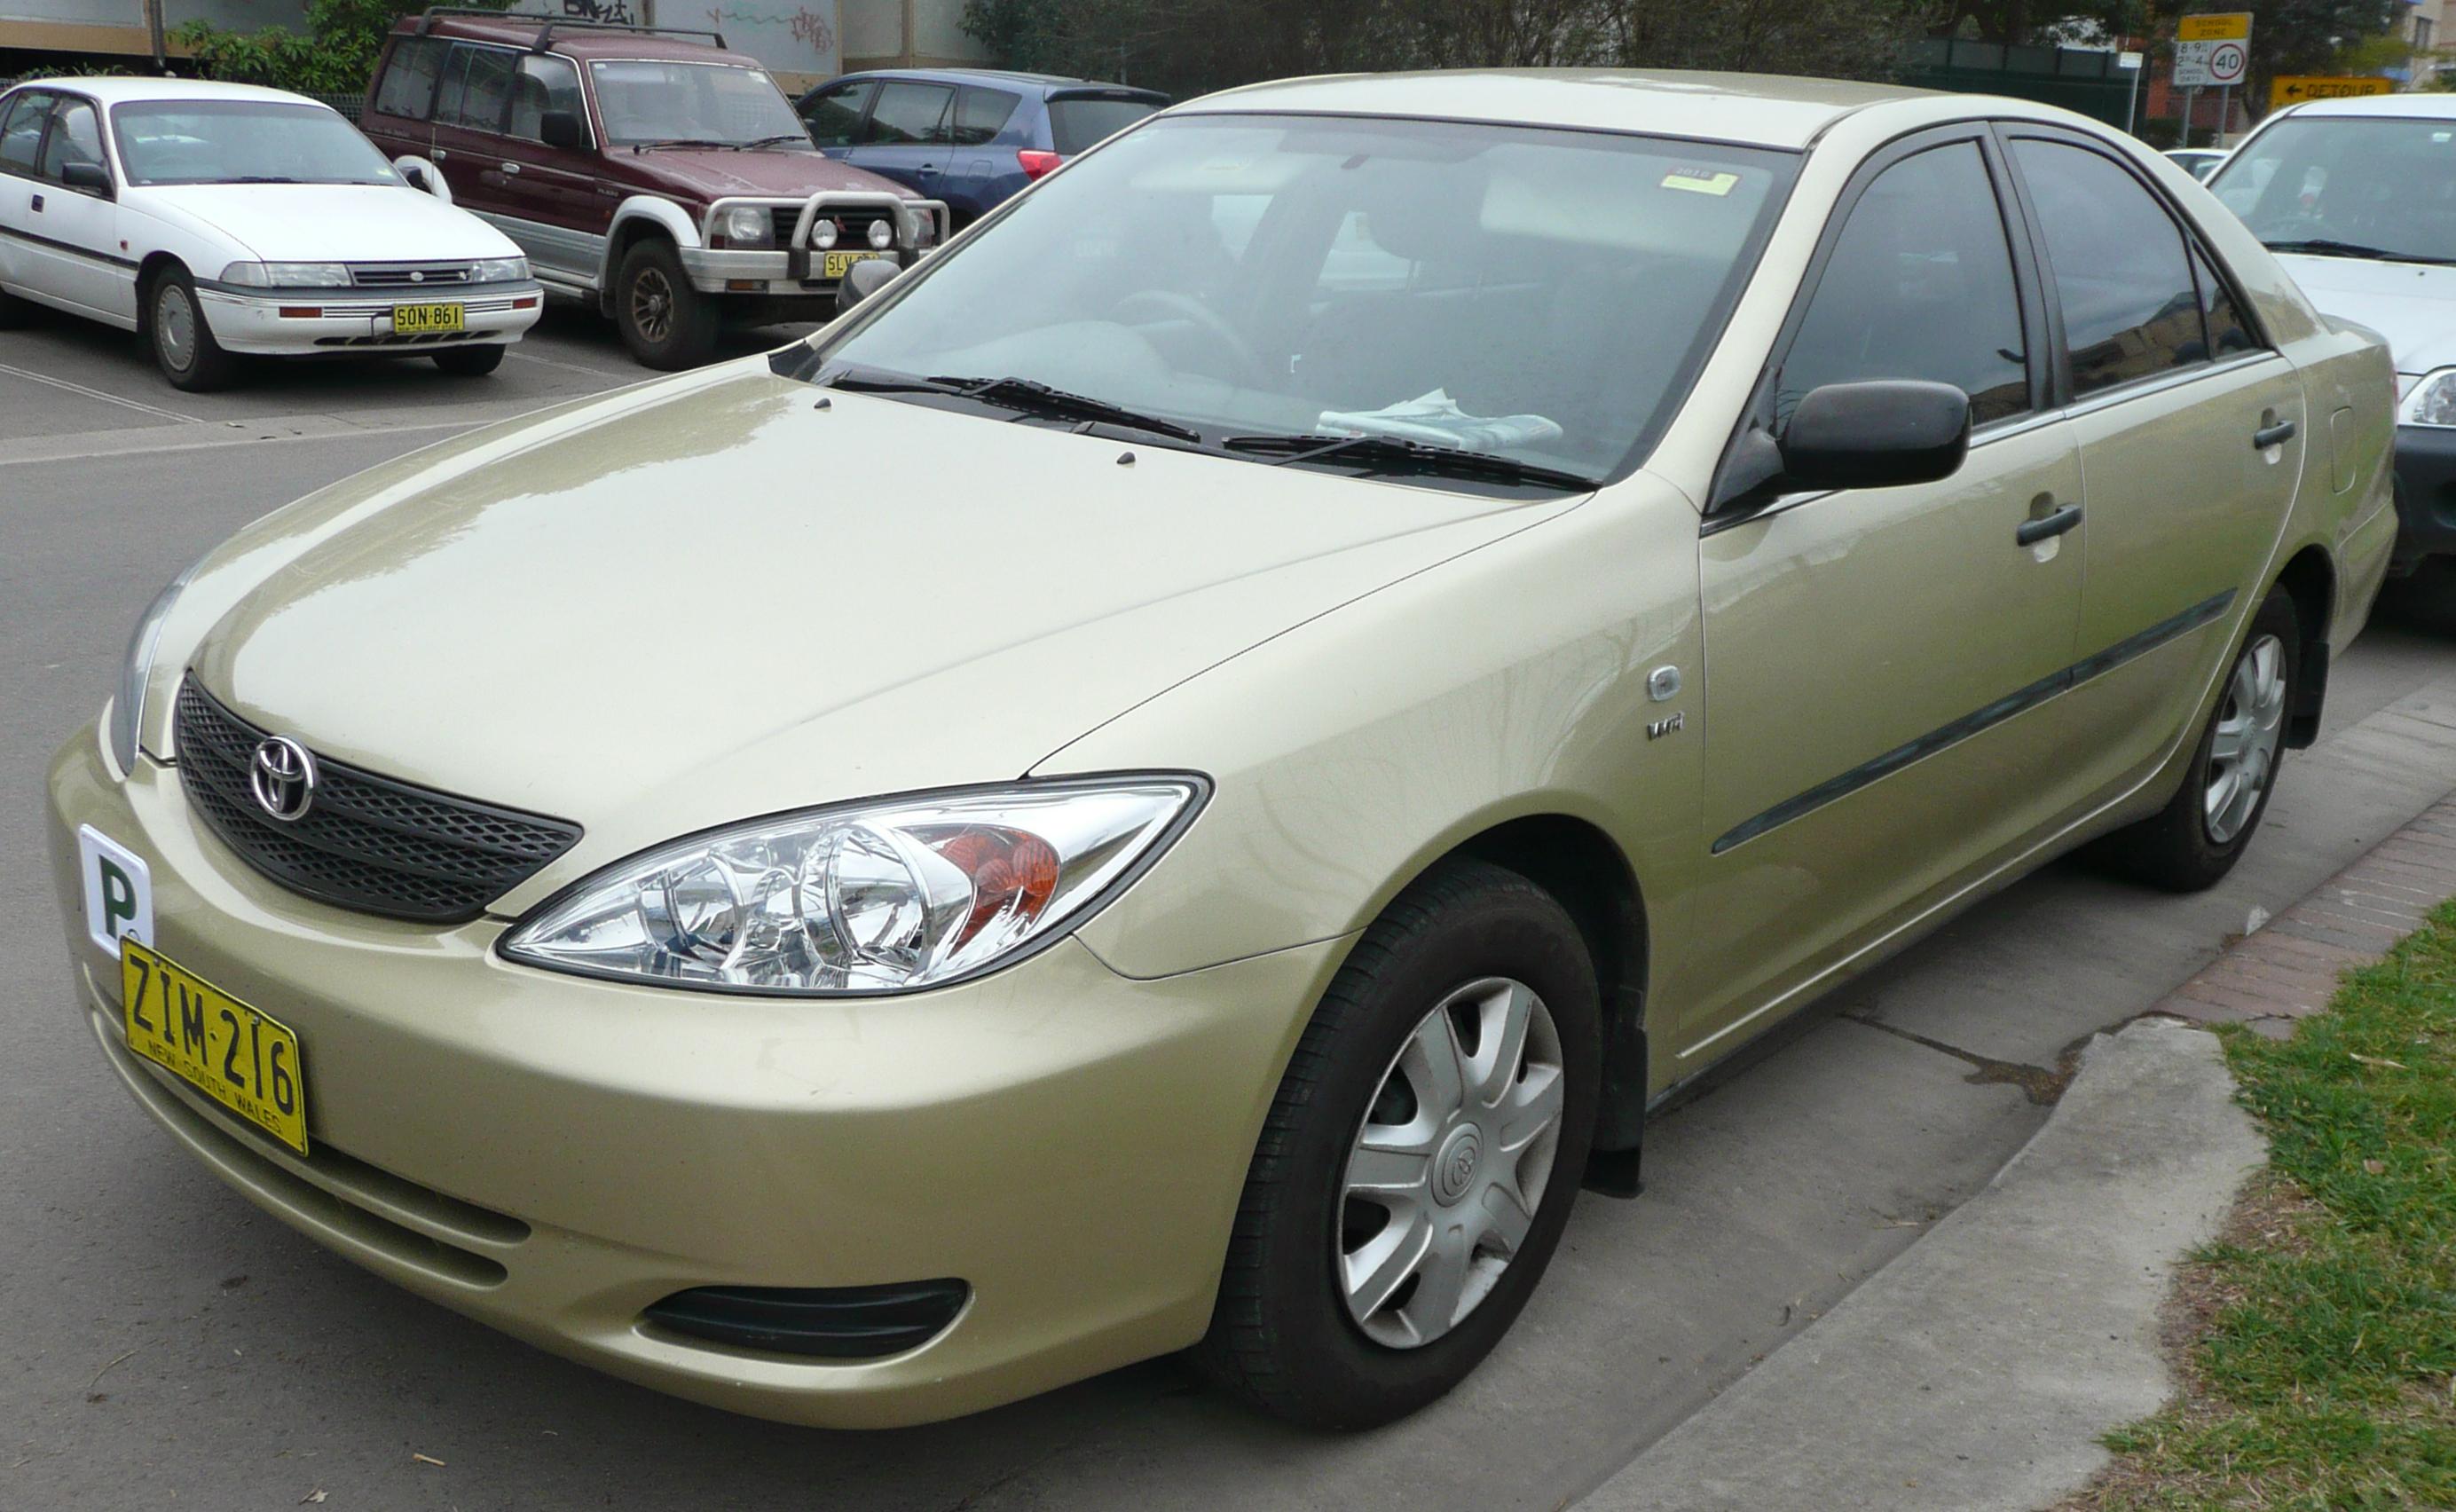 Daihatsu Altis II Restyling 2004 - 2005 Sedan #2